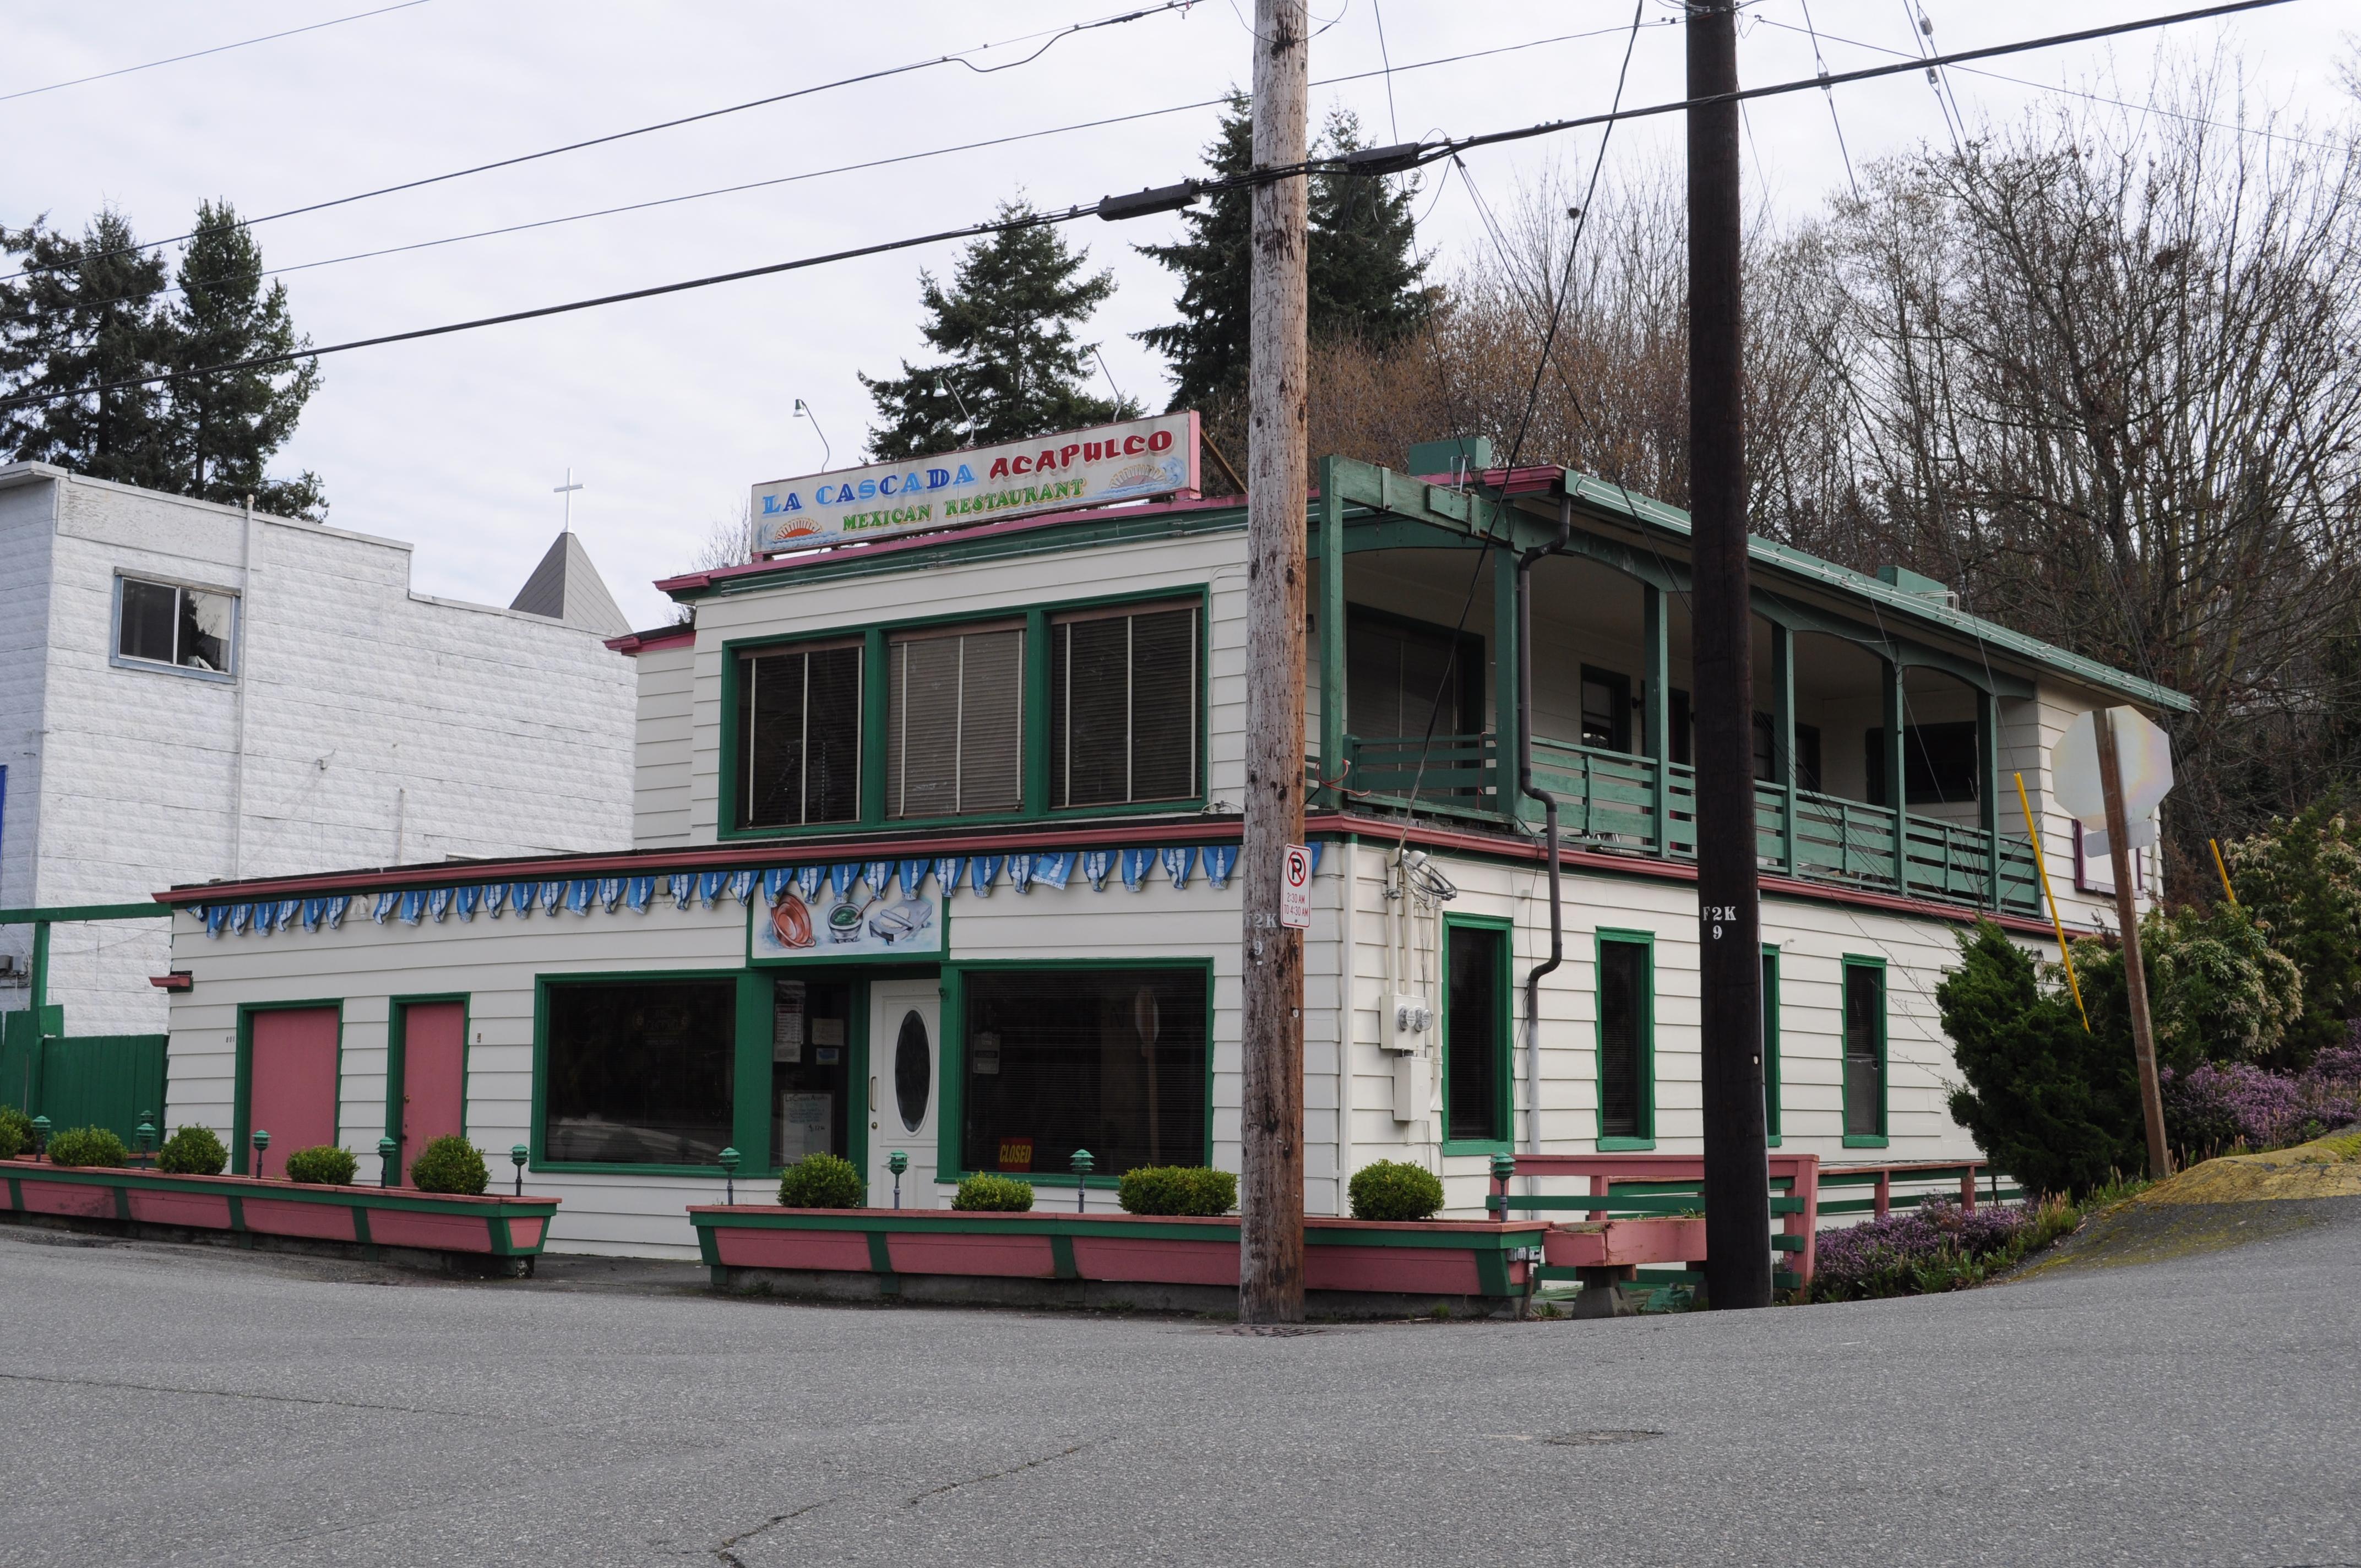 Mexican Restaurant Washington Pa